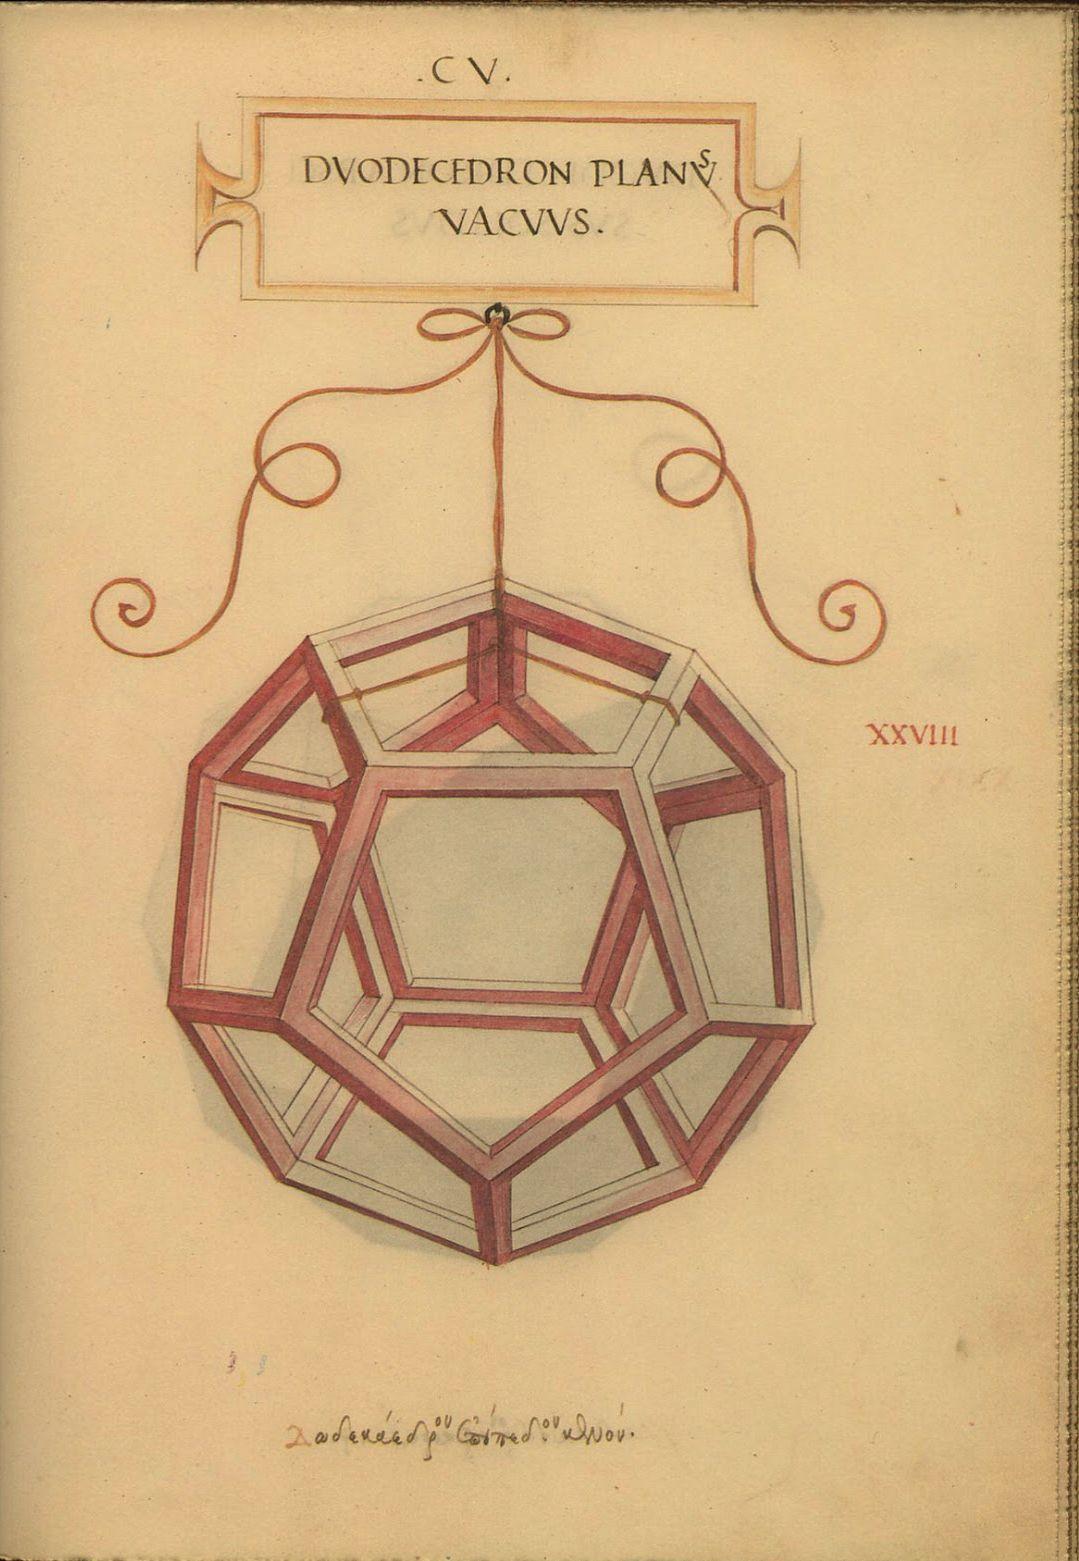 de divina proportione is a book by luca pacioli illustrated by leonardo da vinci graphicine [ 1079 x 1561 Pixel ]